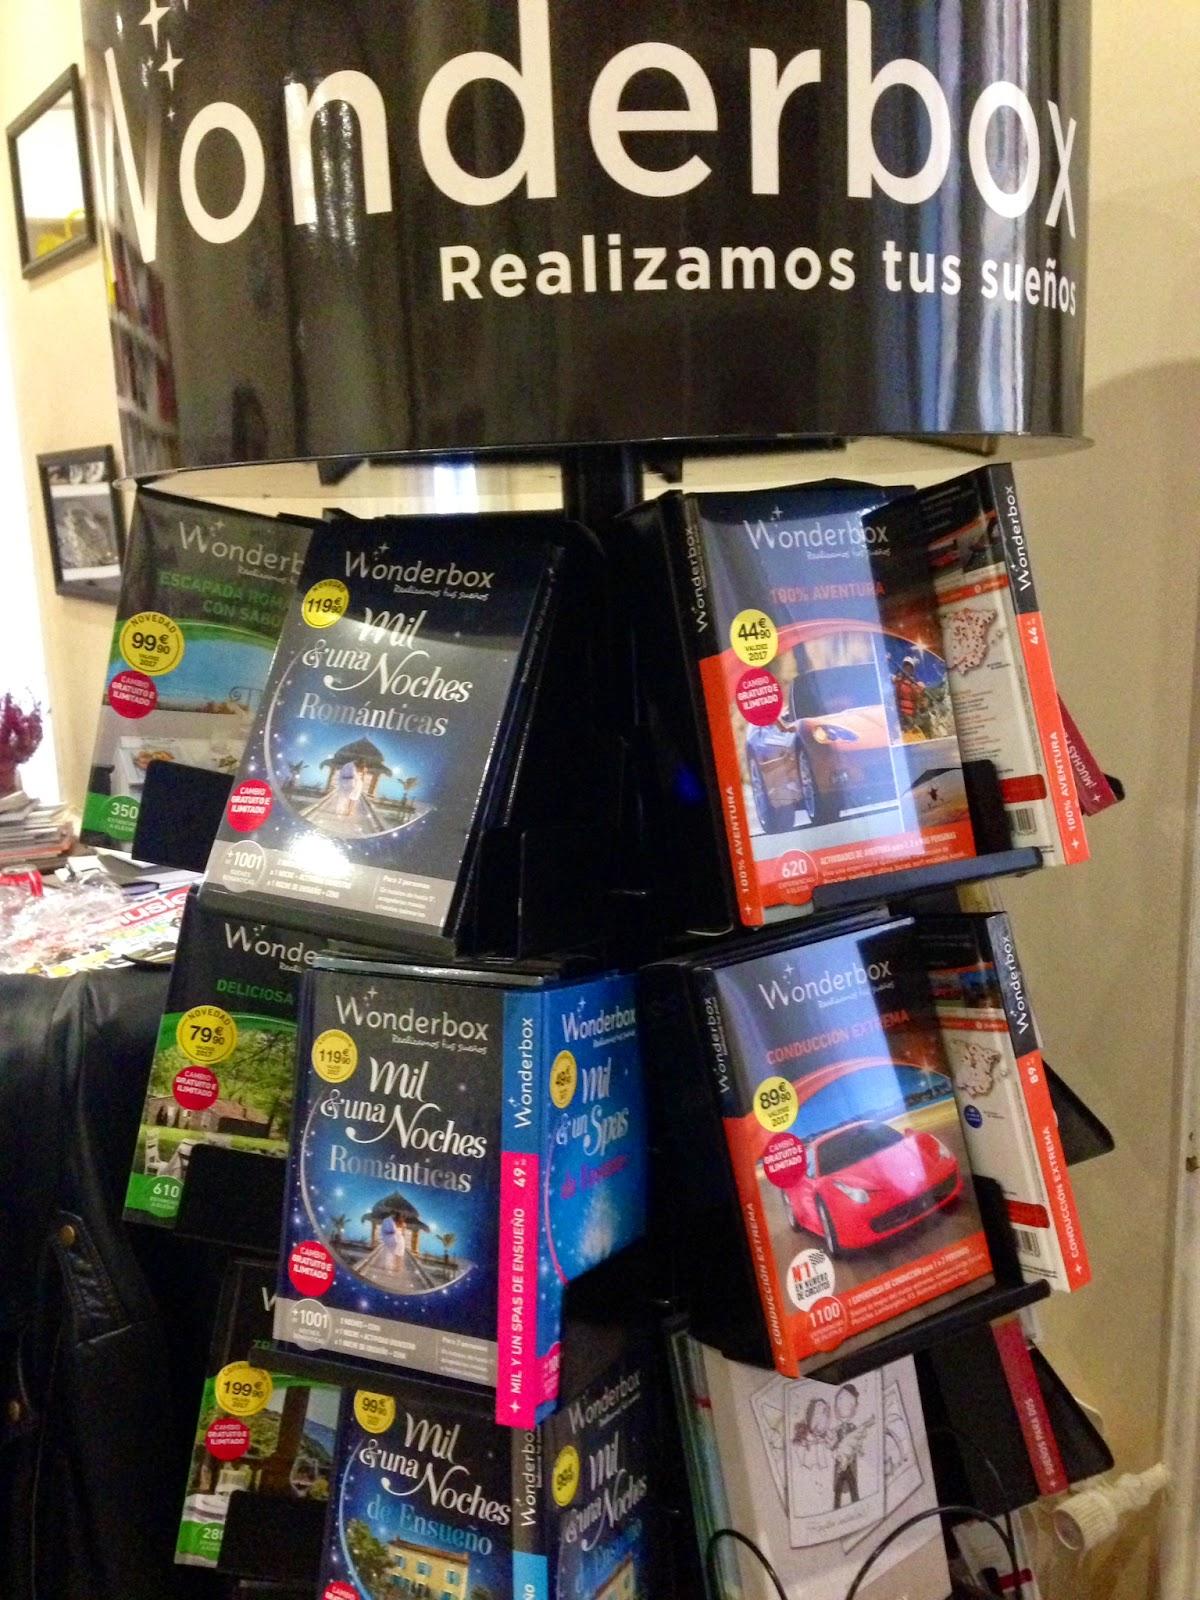 Wonderbox realiza tus sueños